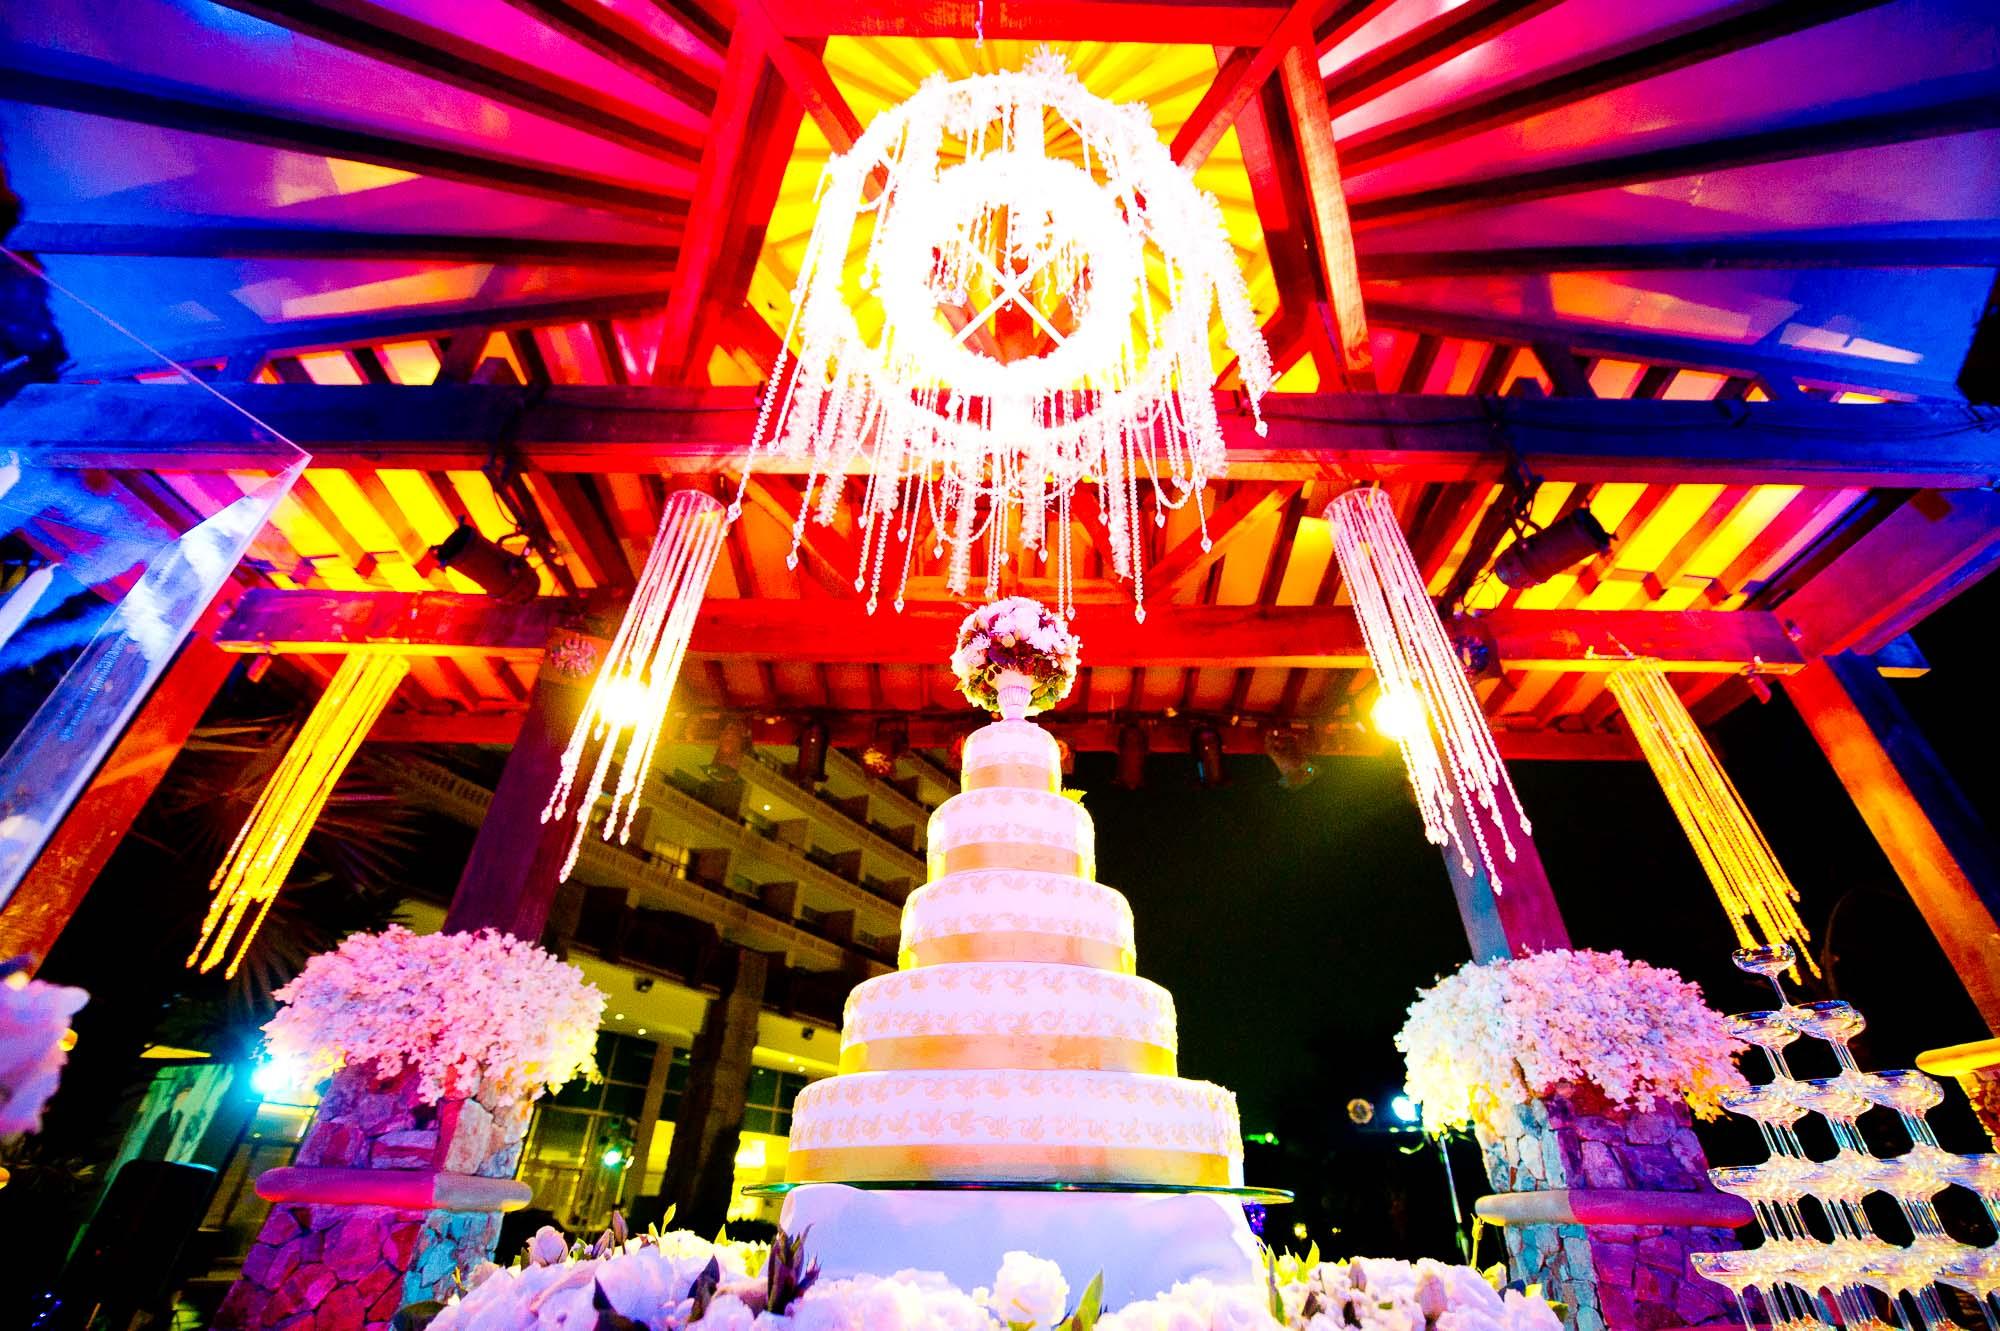 Photo of the Day: Wedding Cake